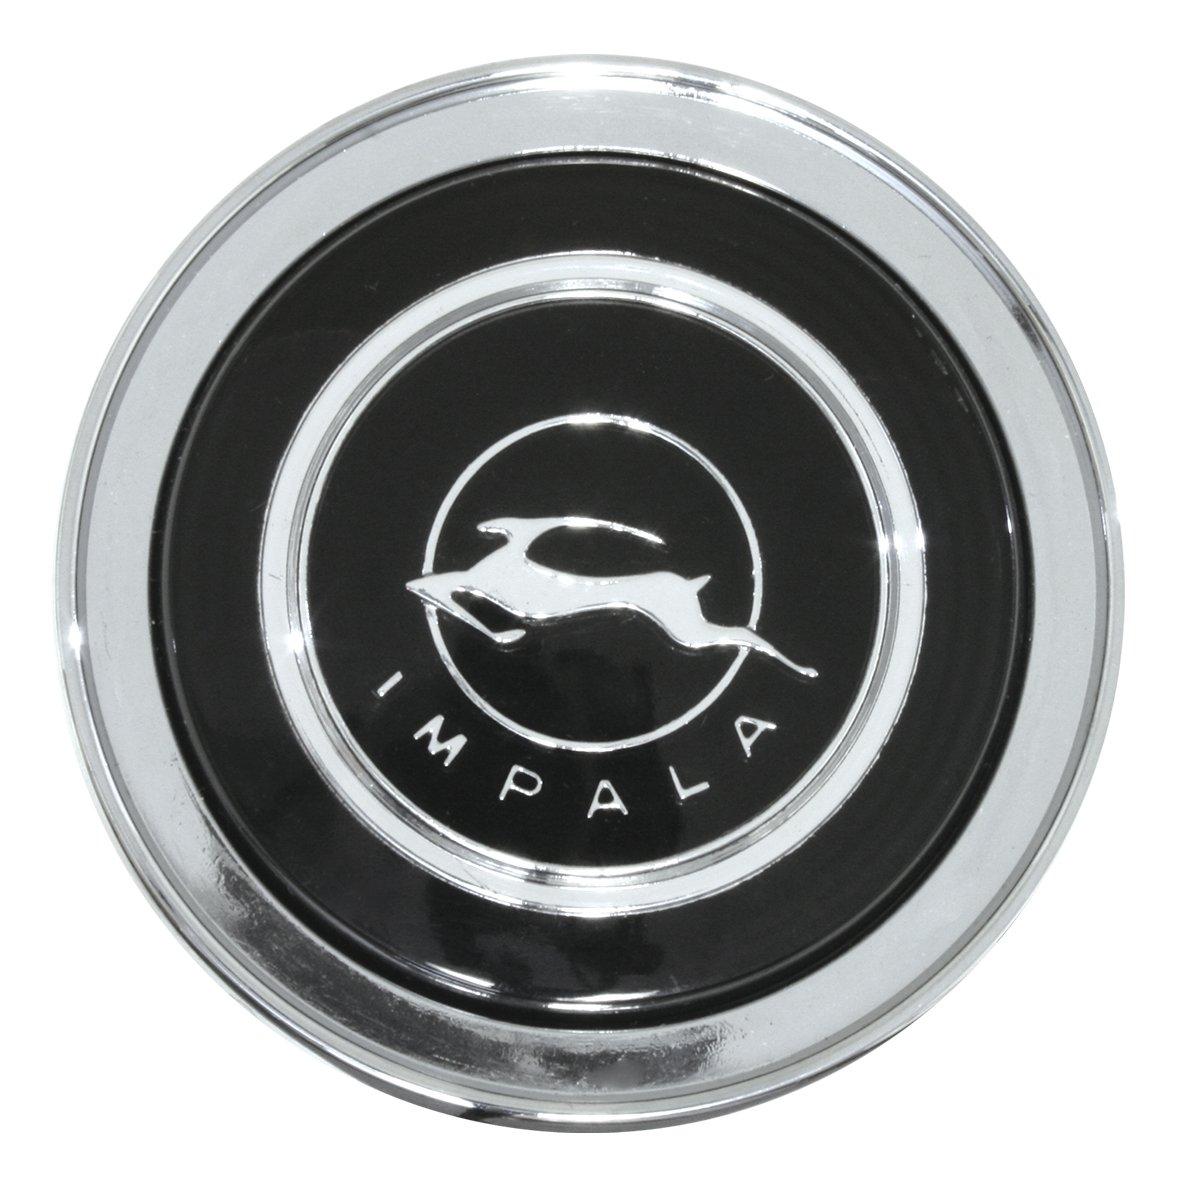 KNS Accessories KC9203 1964 Impala Horn Button Emblem